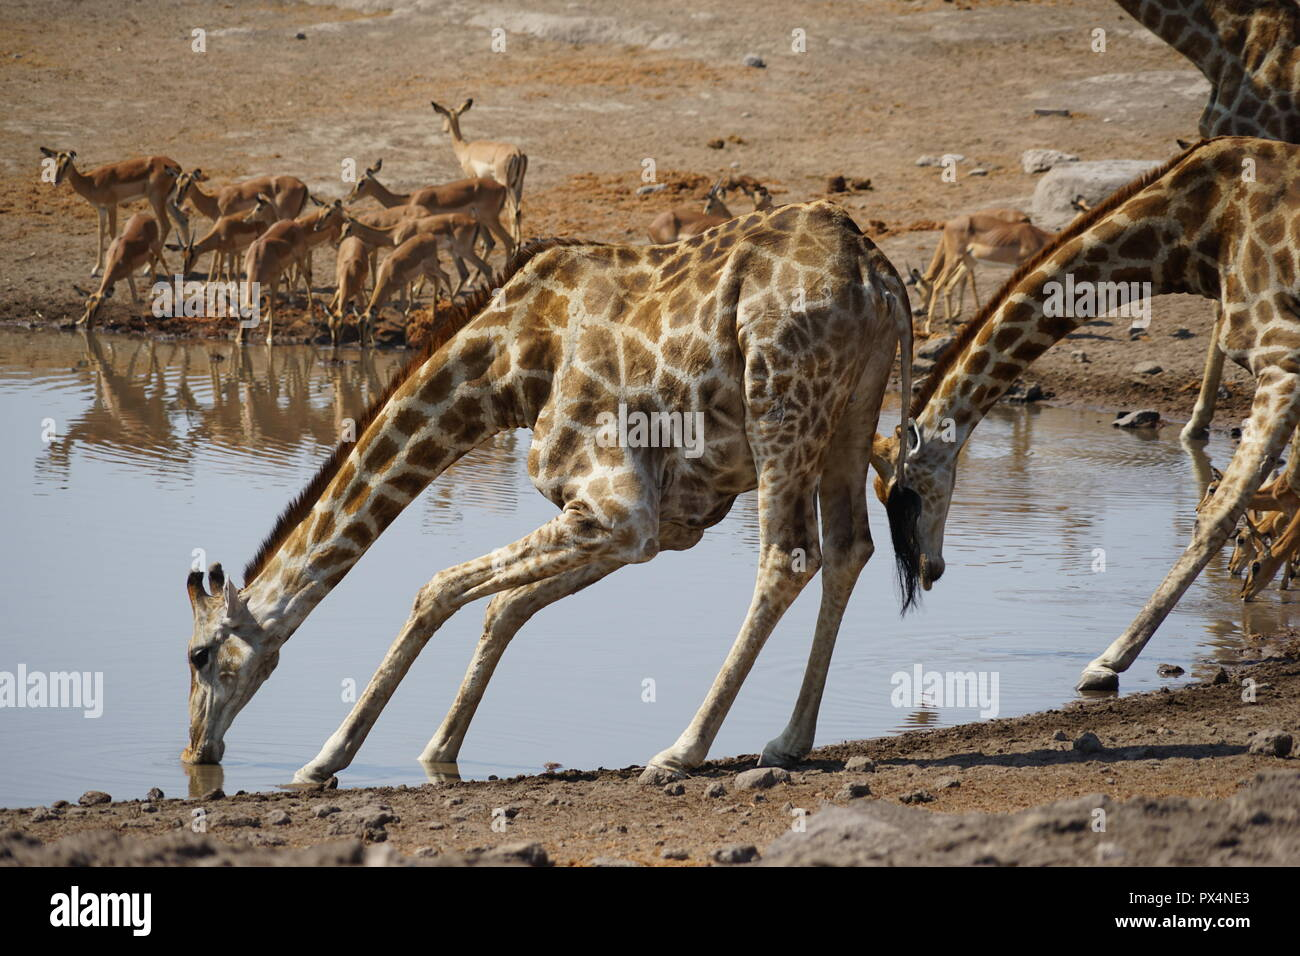 Giraffen und andere Tiere am Wasserloch 'Chudob', Etosha Nationalpark, Namibia Namibia, Afrika - Stock Image